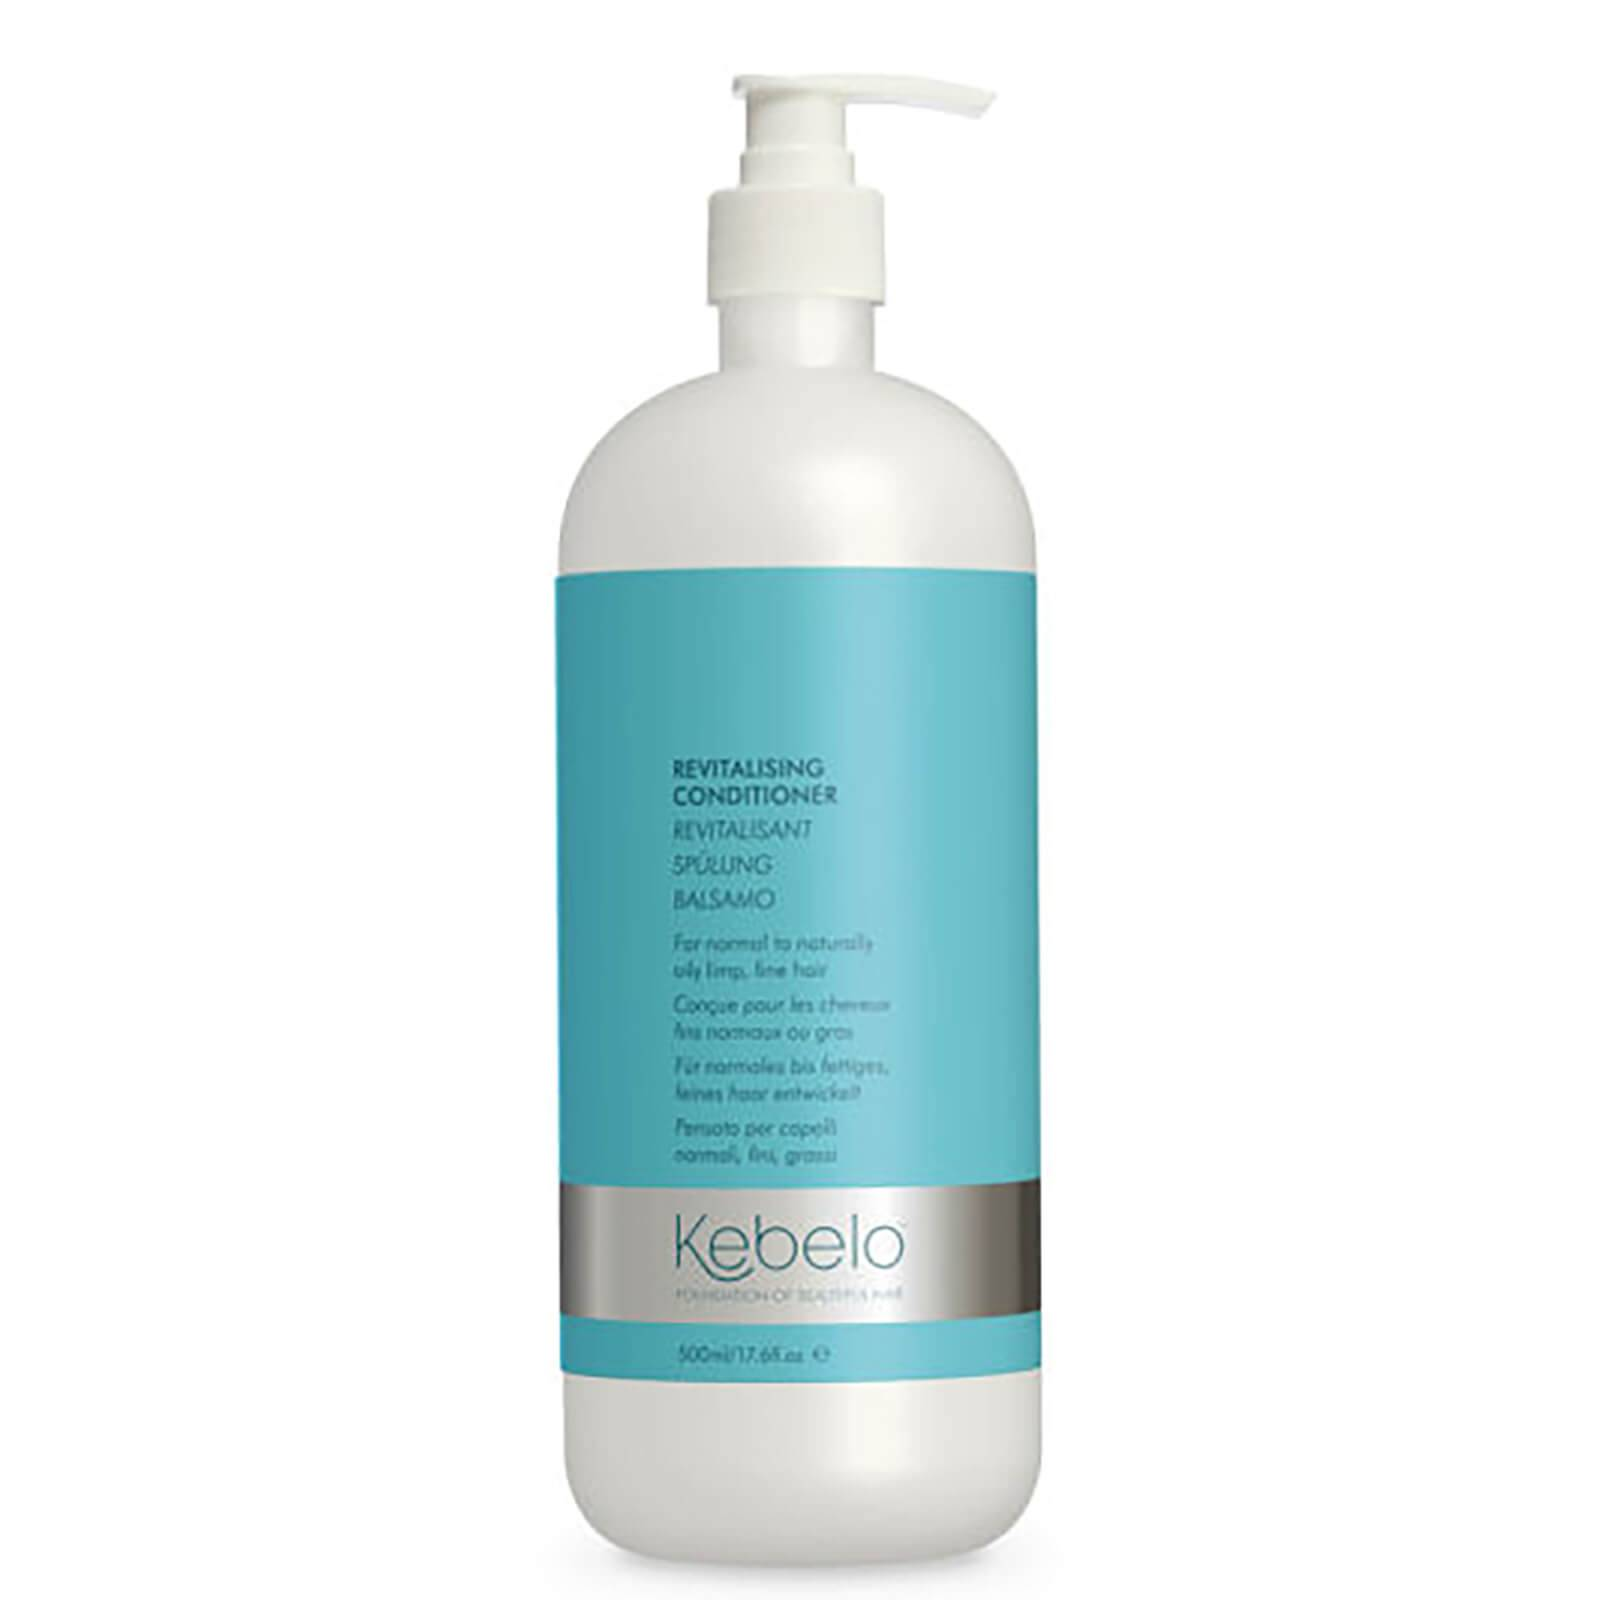 Kebelo Après-shampooing Kebelo Revitalising Conditioner (500 ml)